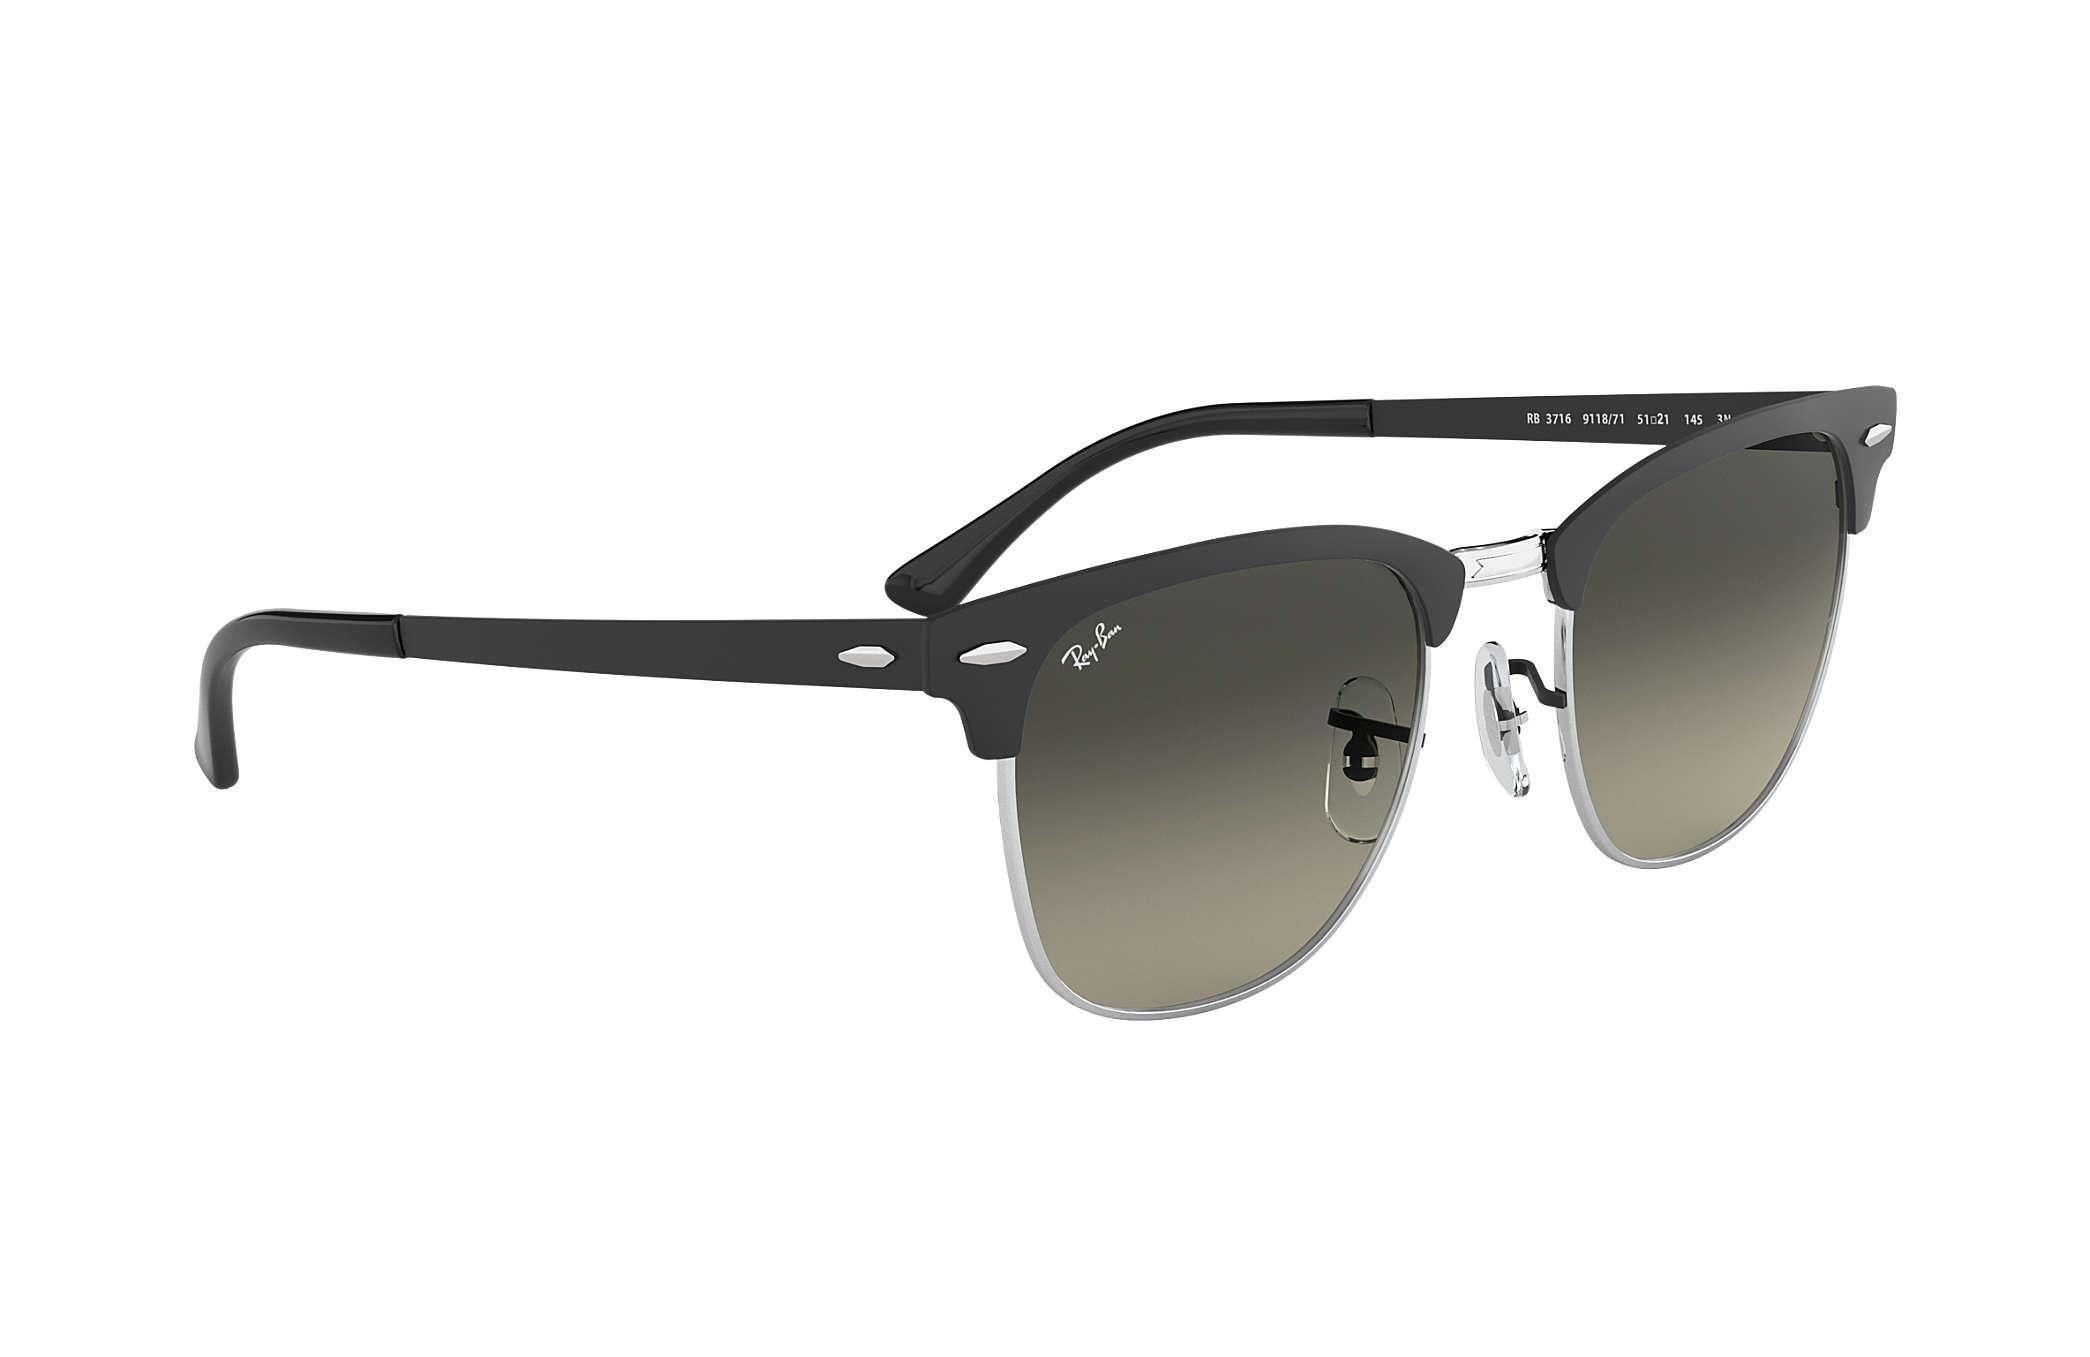 afb3d1e7dbf Ray-Ban Clubmaster Metal RB3716 Black - Nylon - Grey Lenses ...